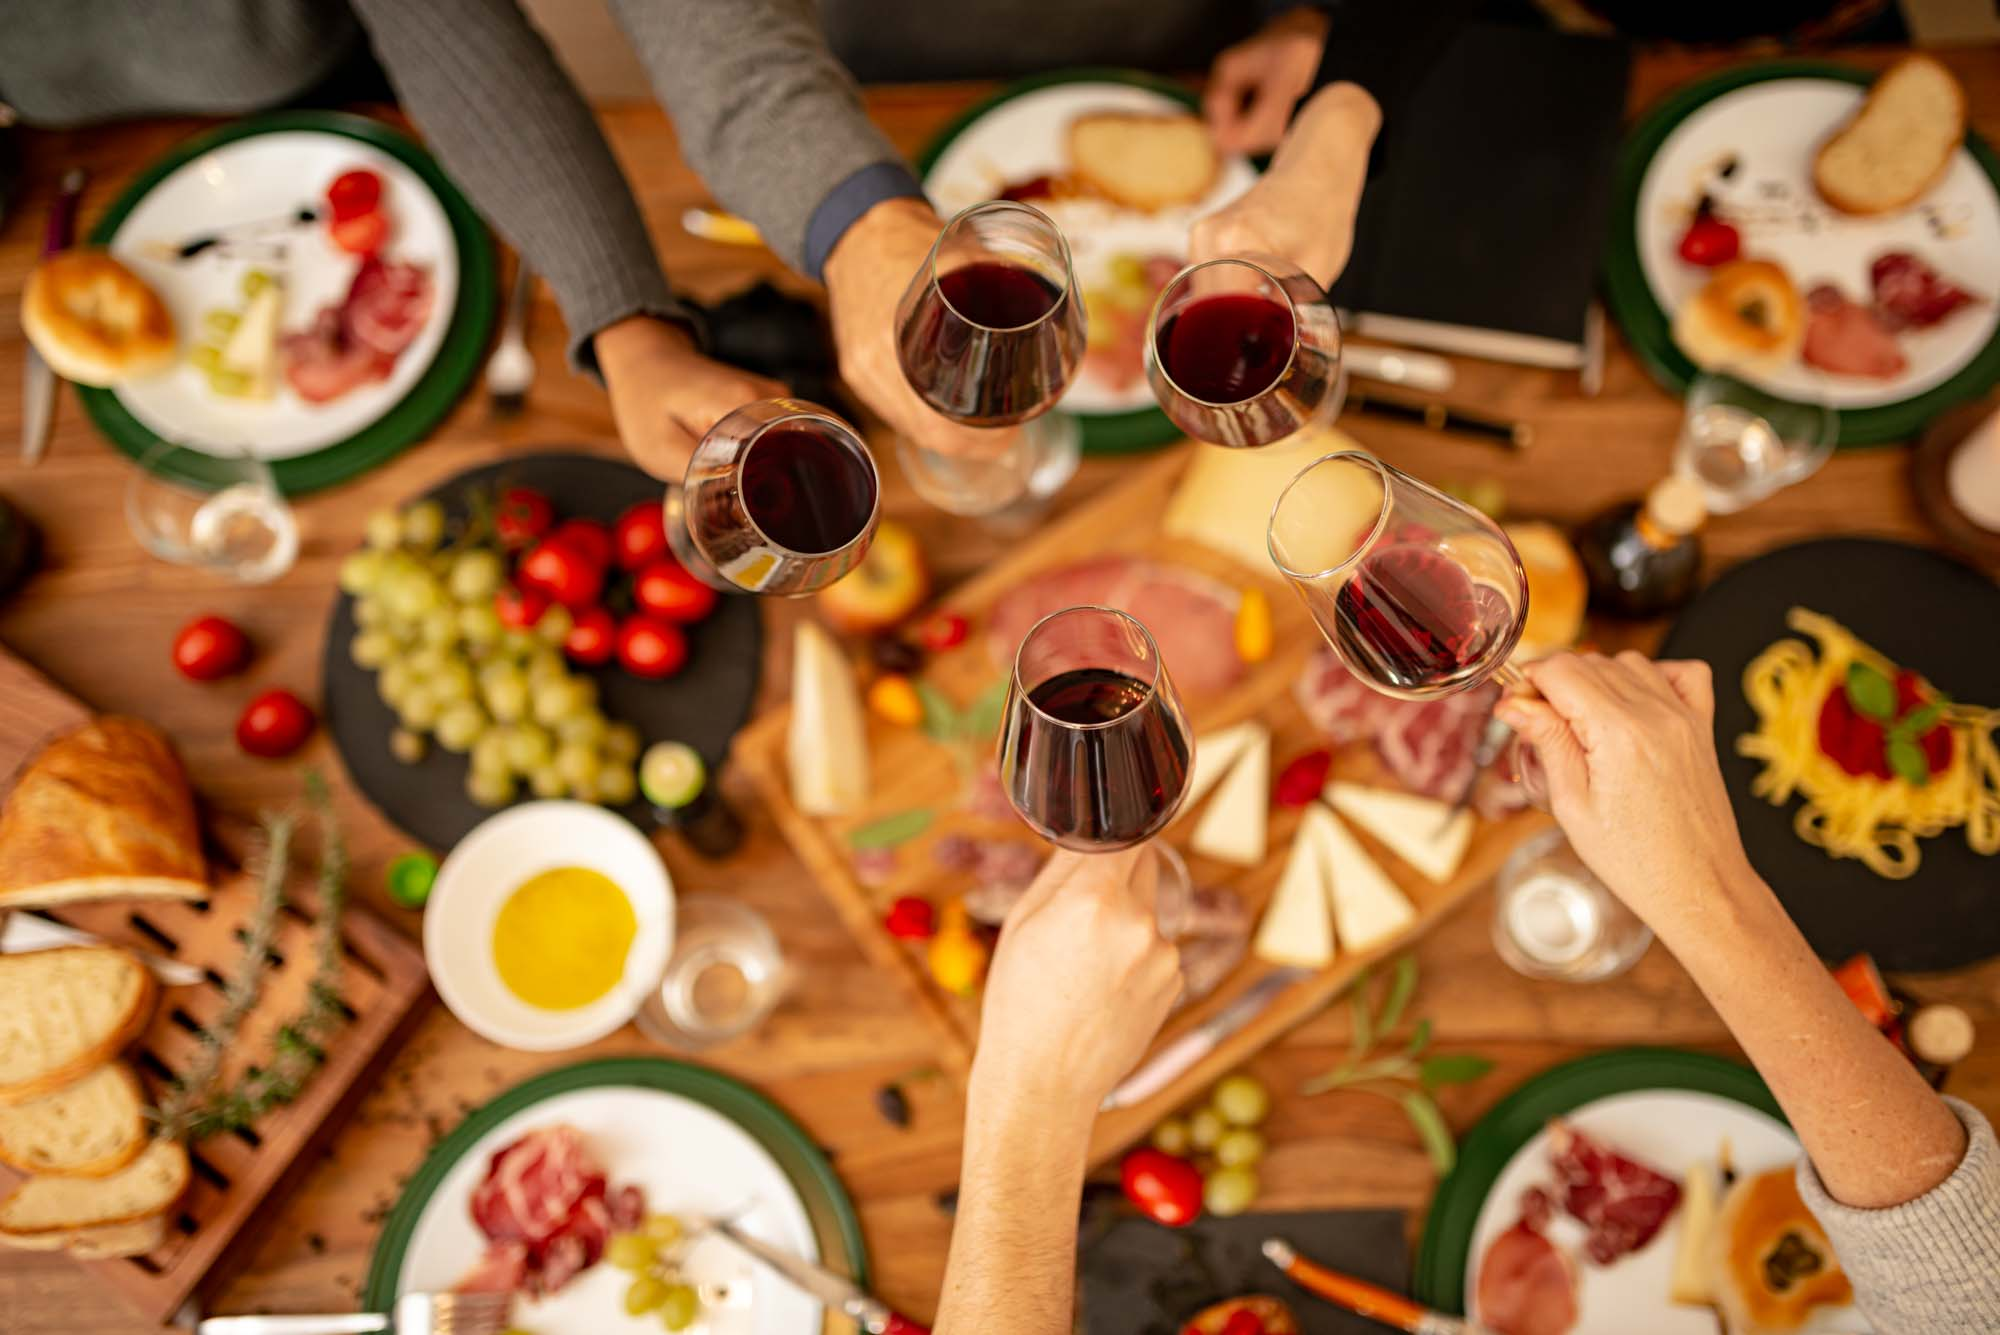 Degustazioni Vino Cene Aziendali a Brescia